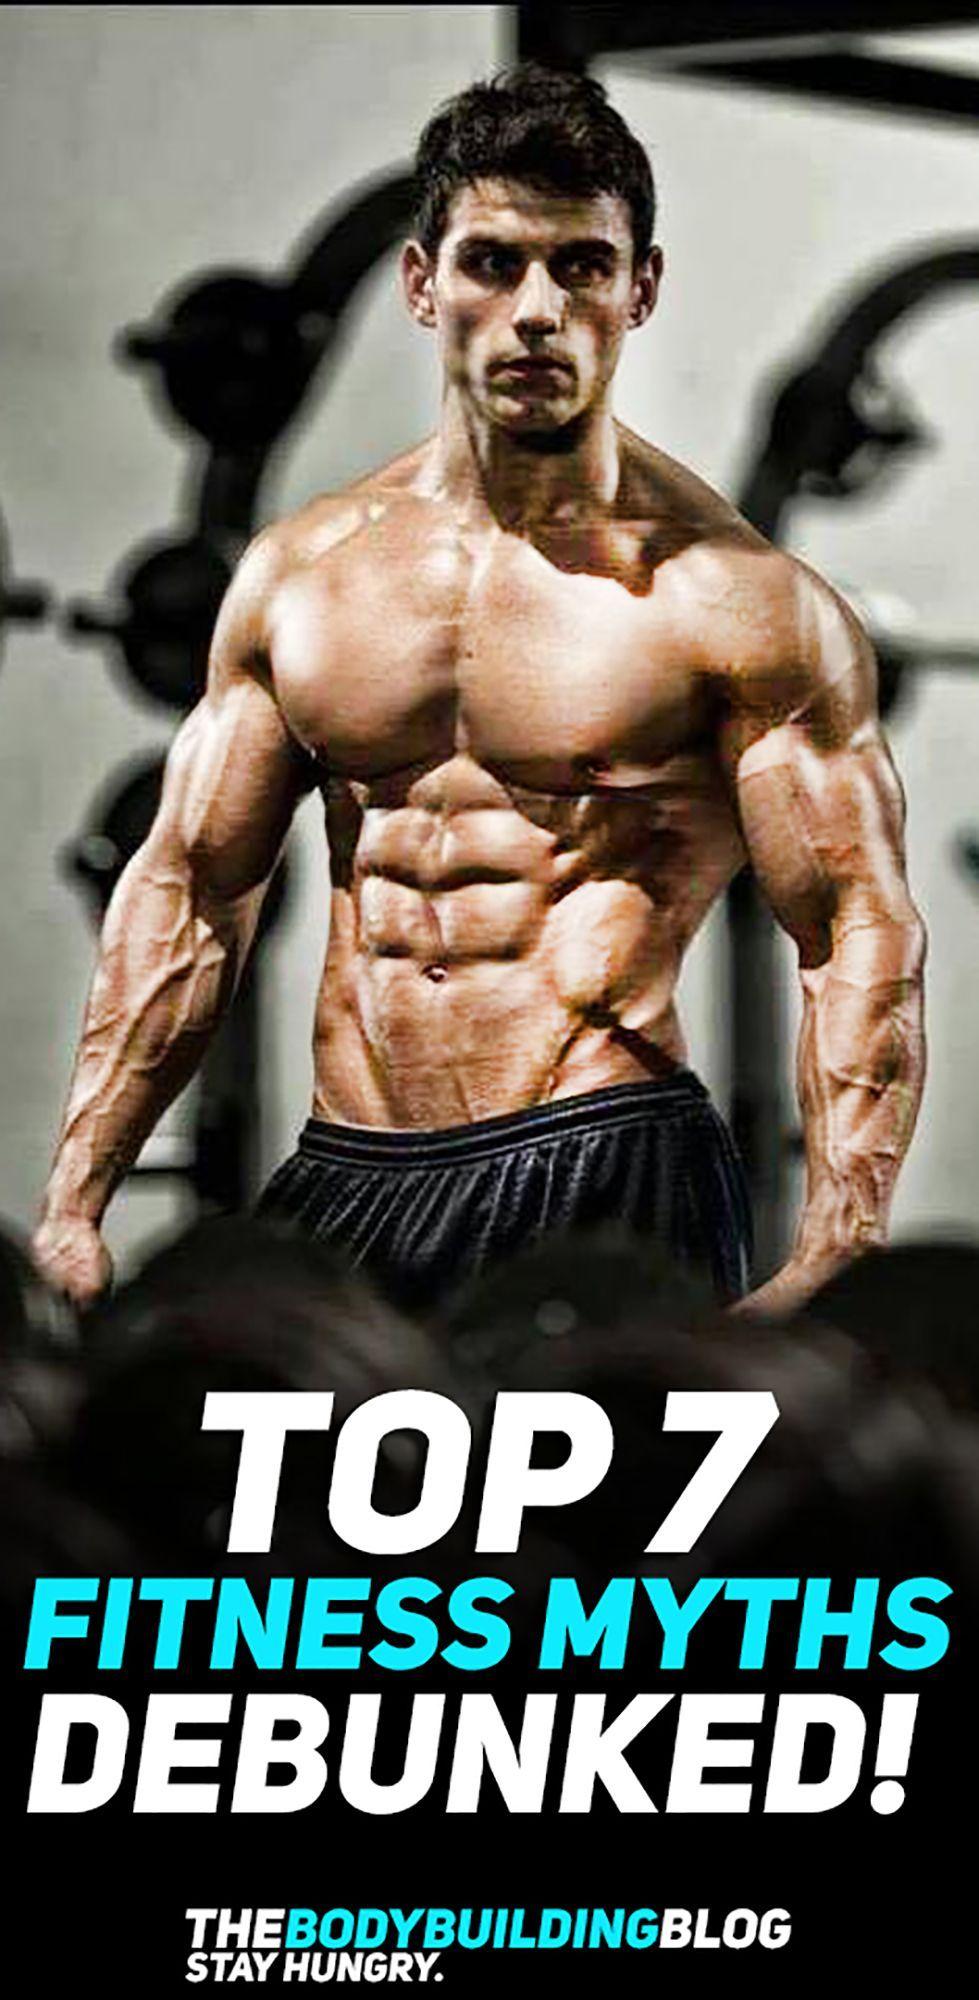 #Debunked #Fitness #FitnessTransformationrealistic #Health #Myths #THEBODYBUILDINGBLOG #Top Top 7 He...